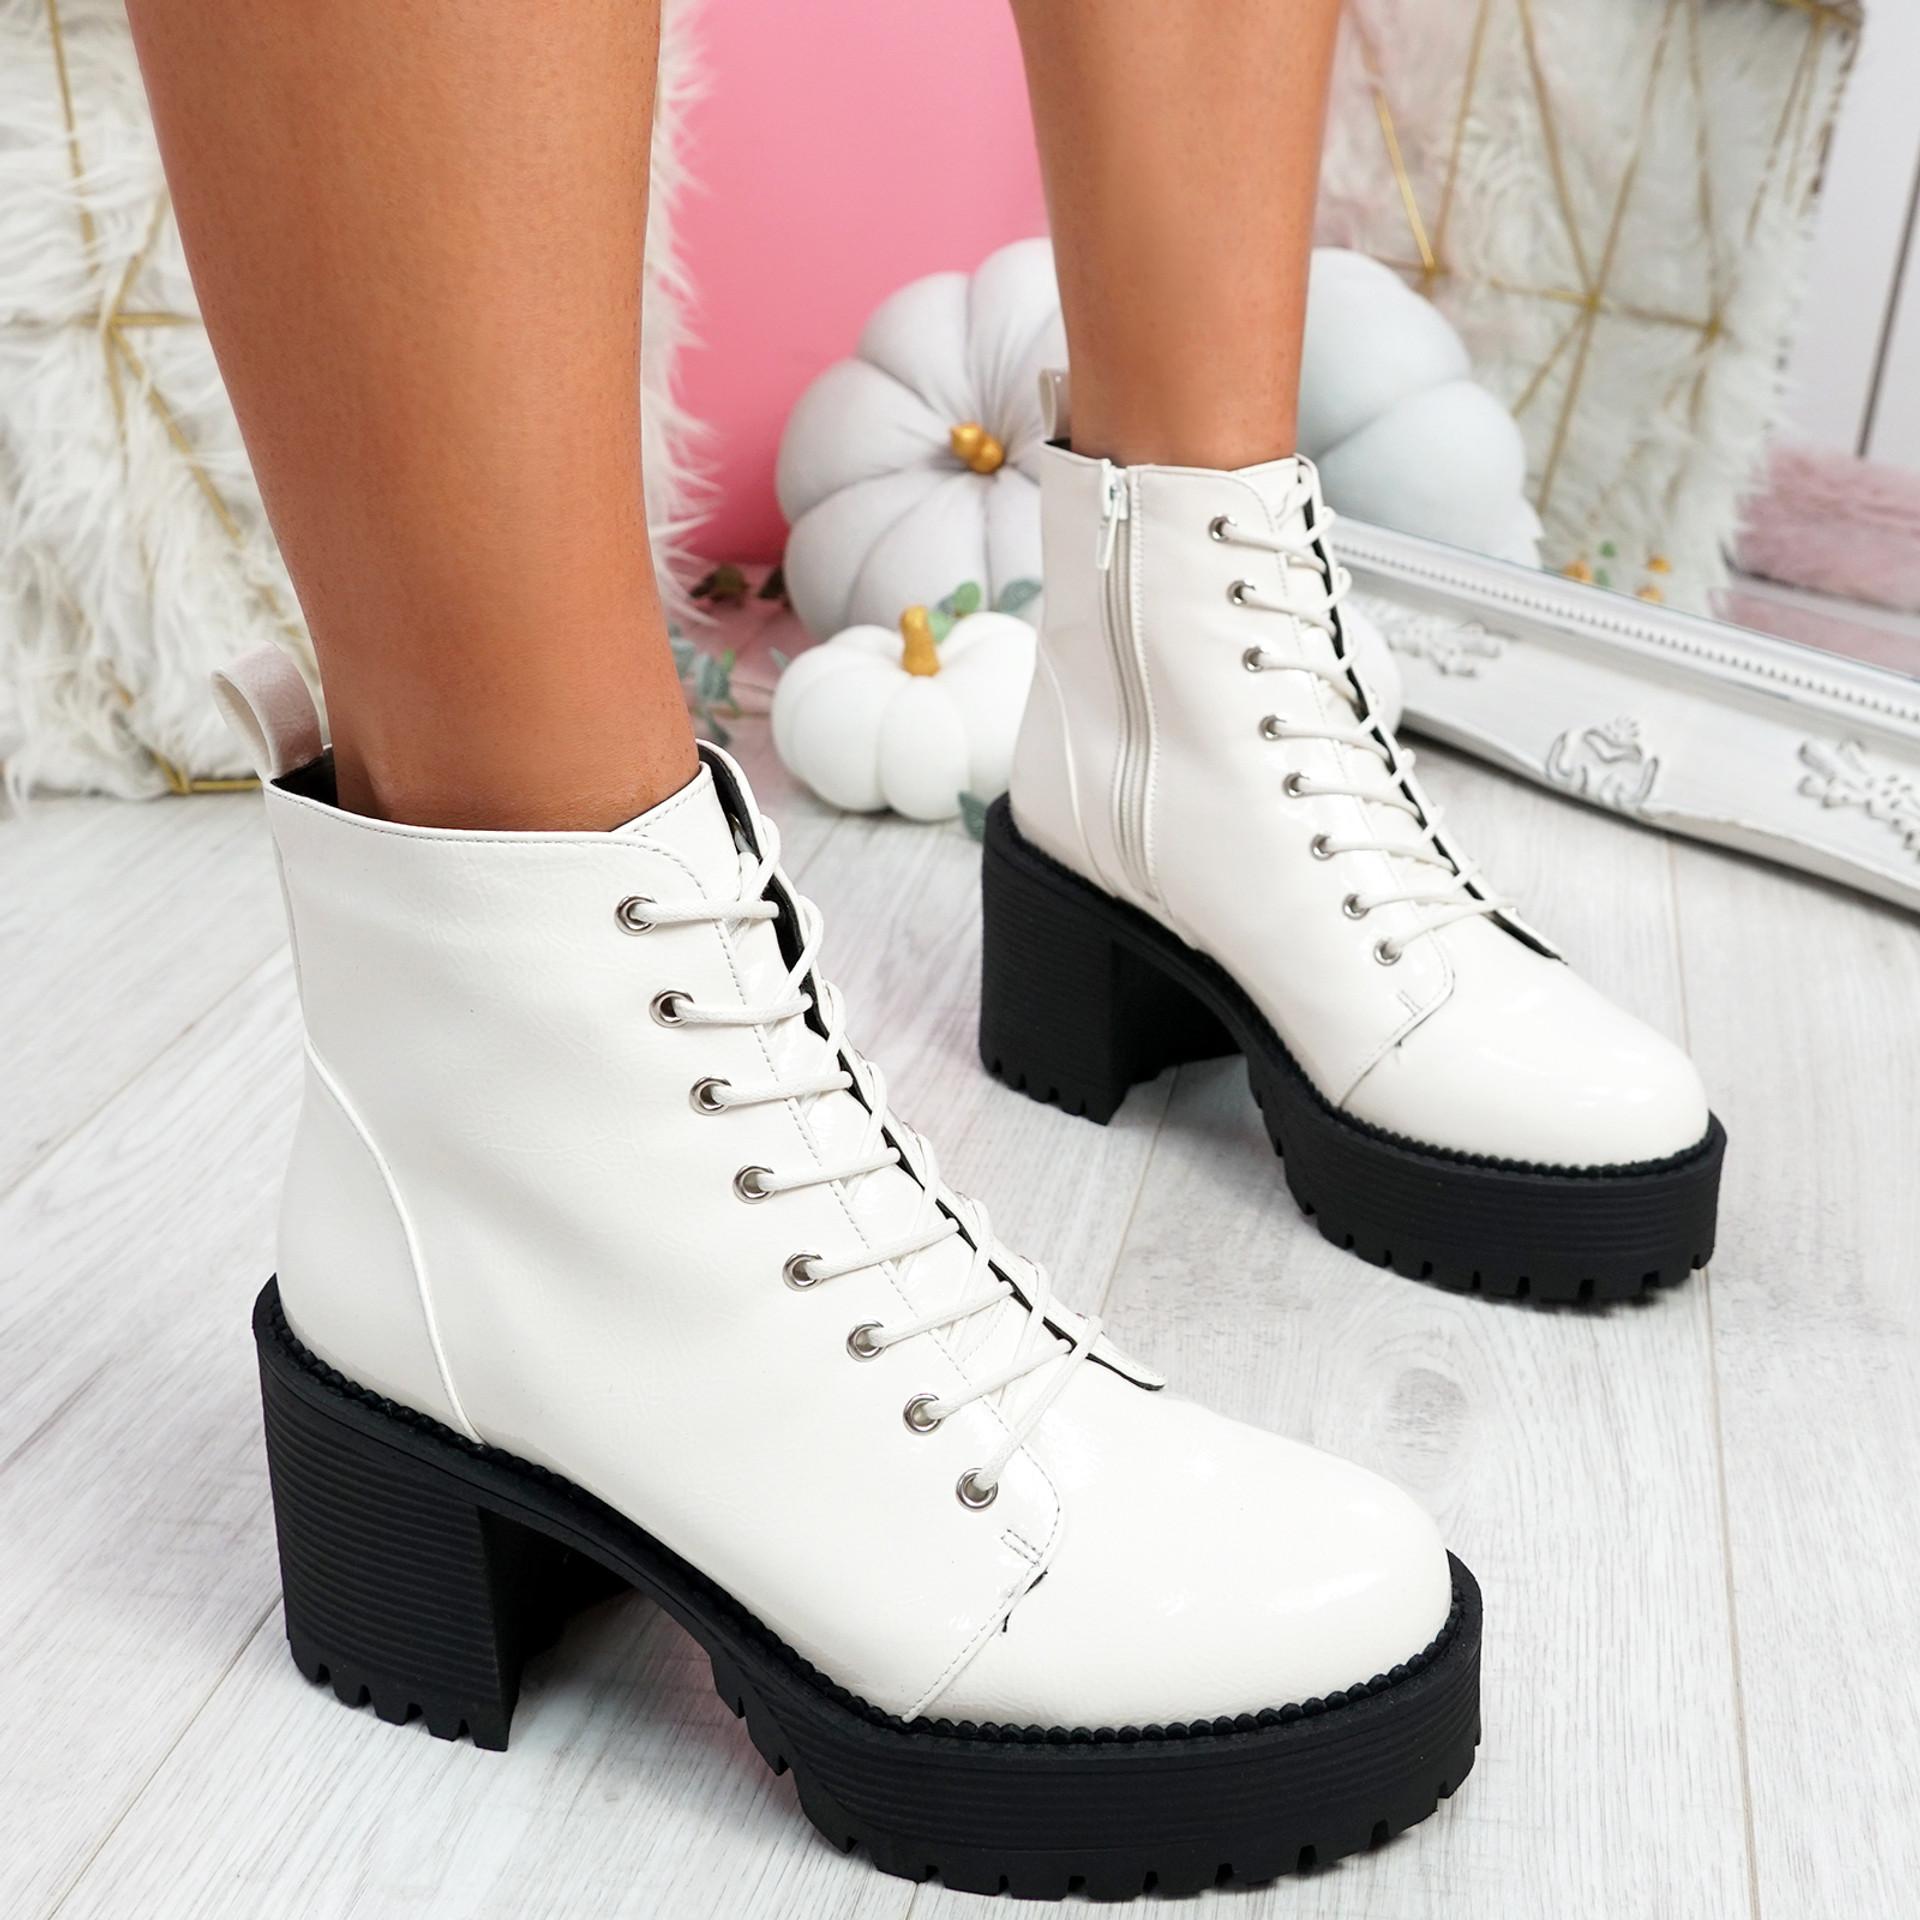 Nudda White Block Heel Ankle Boots